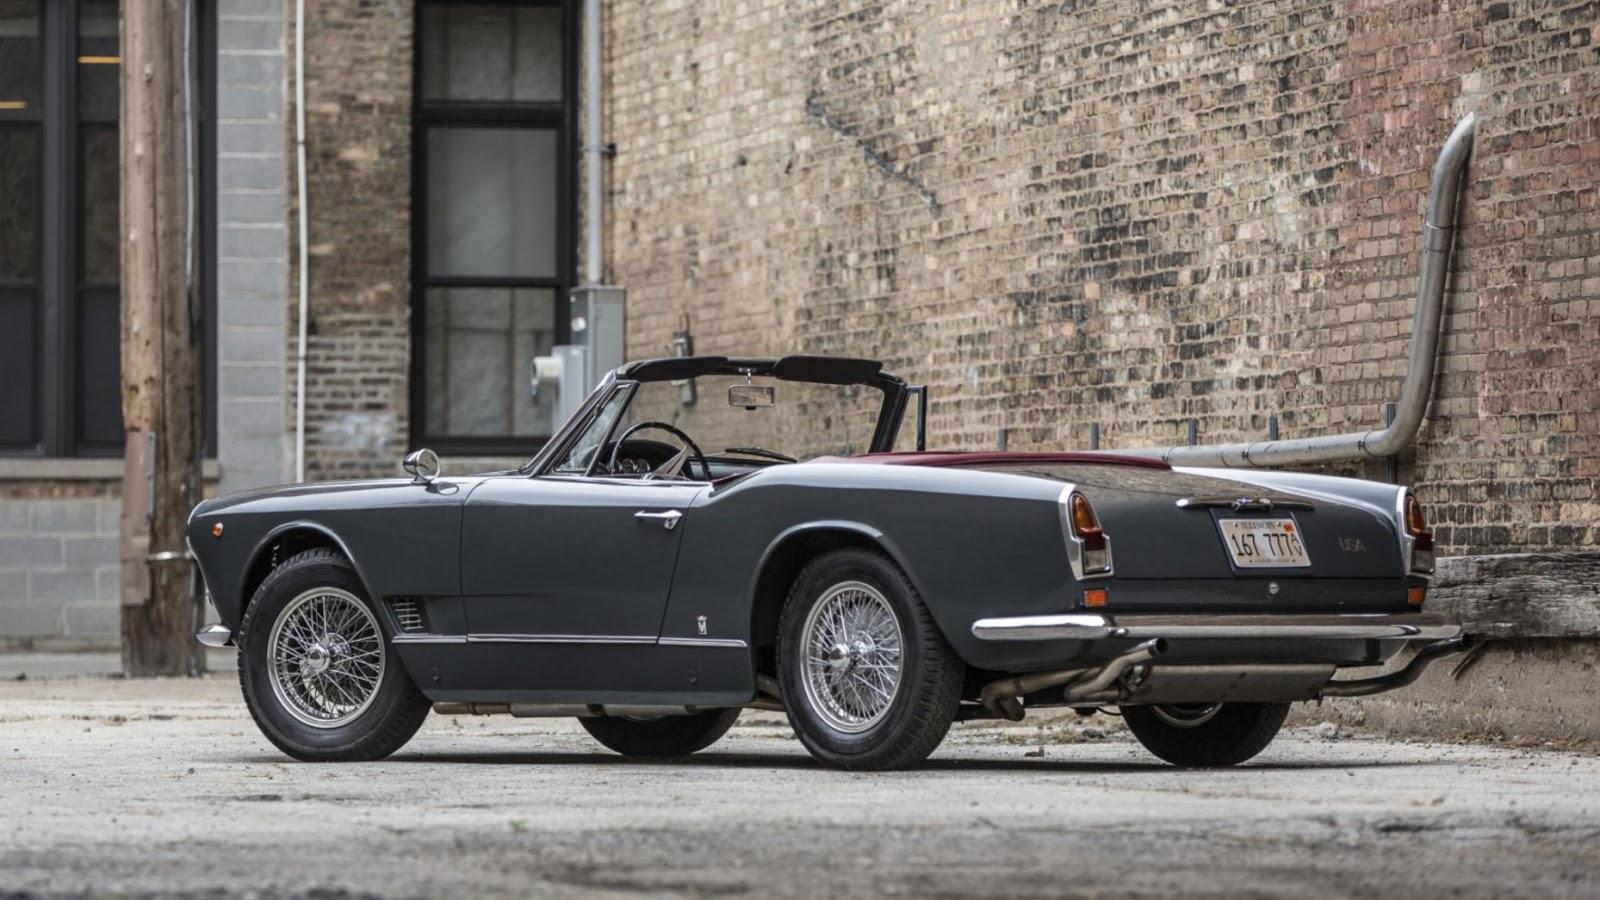 1960 Maserati 3500 GT Spyder: $880,000